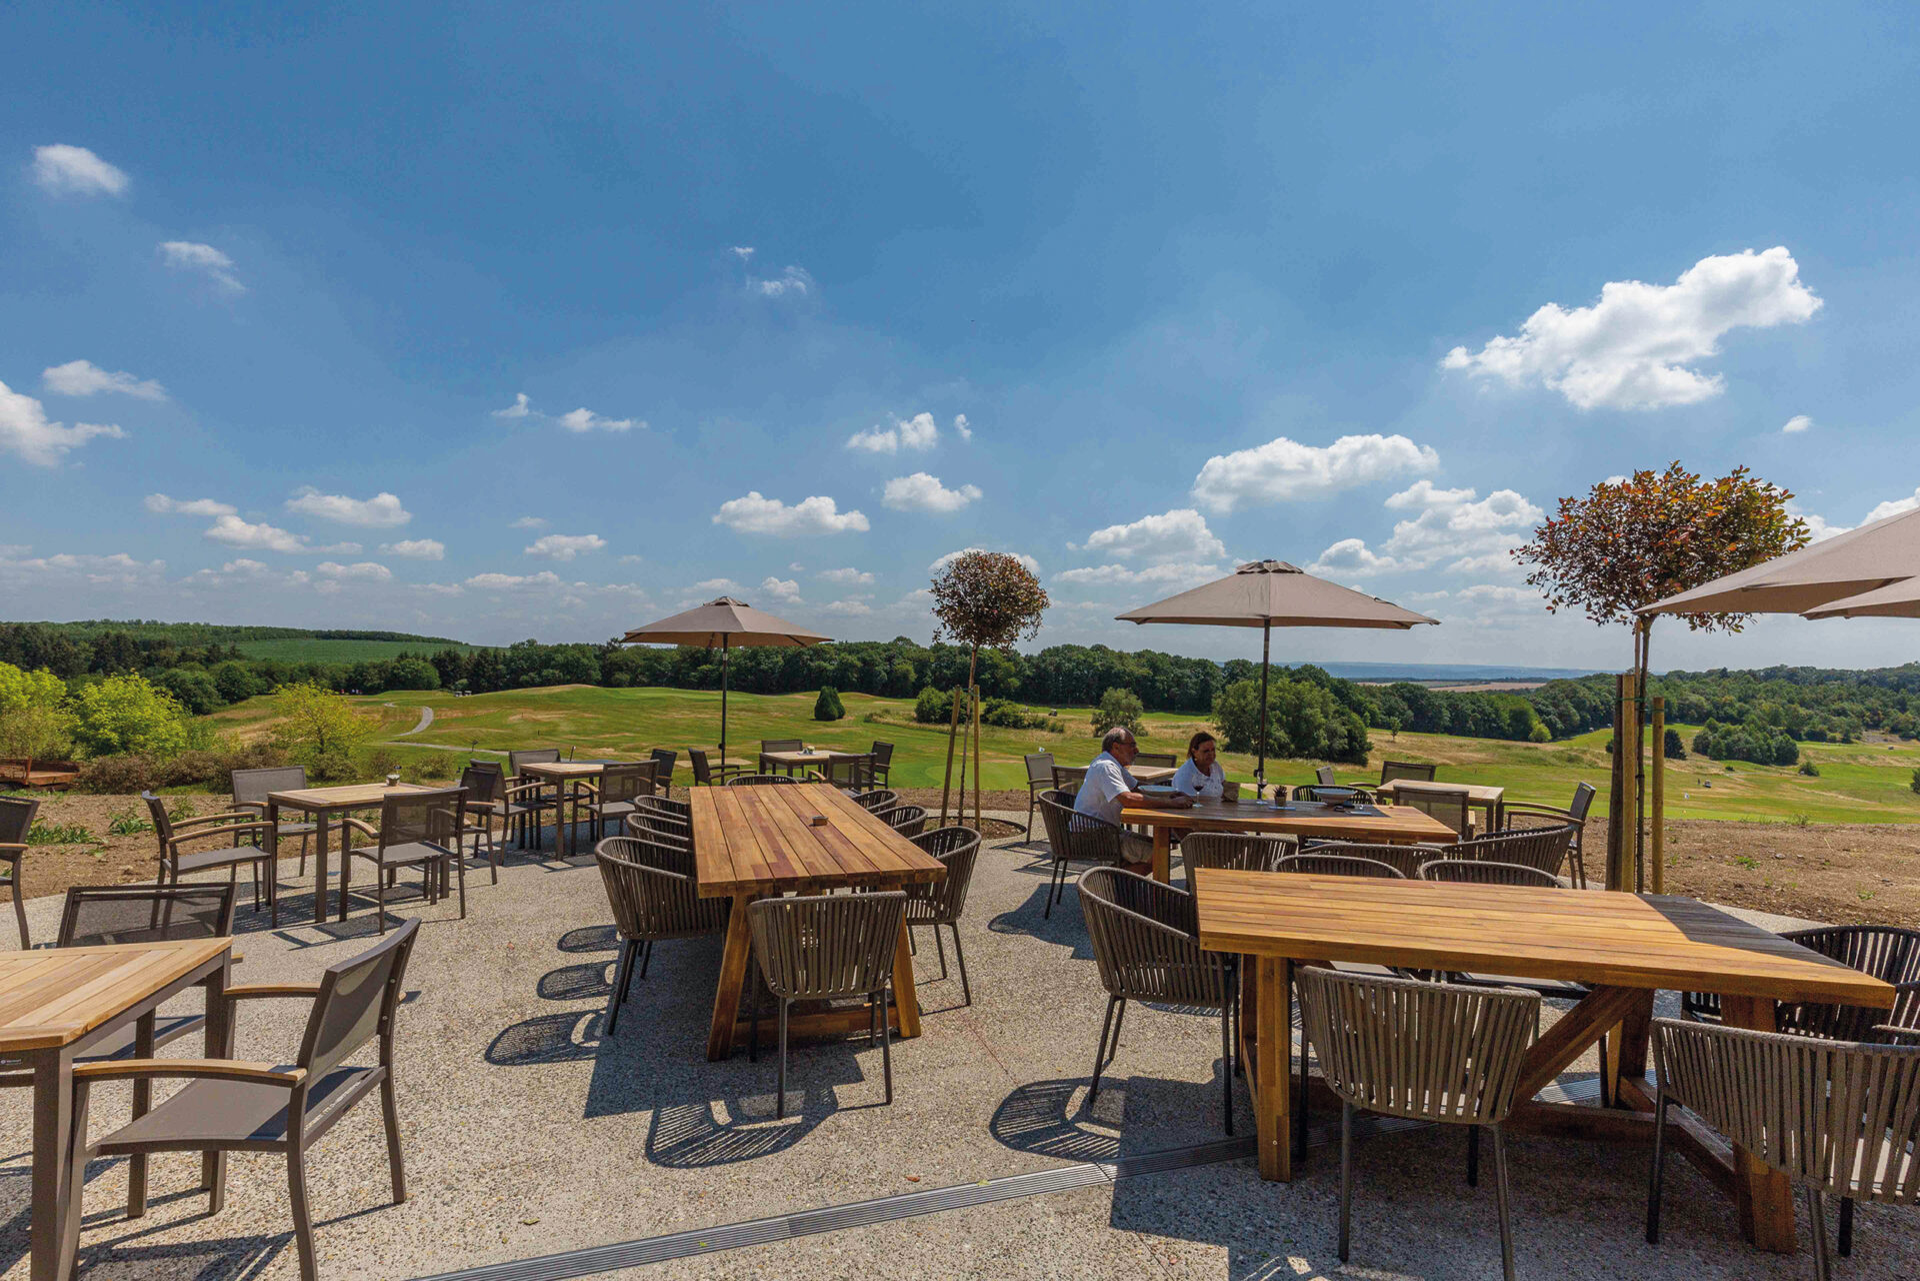 Belgie Five Nations Golfhotel terras groot